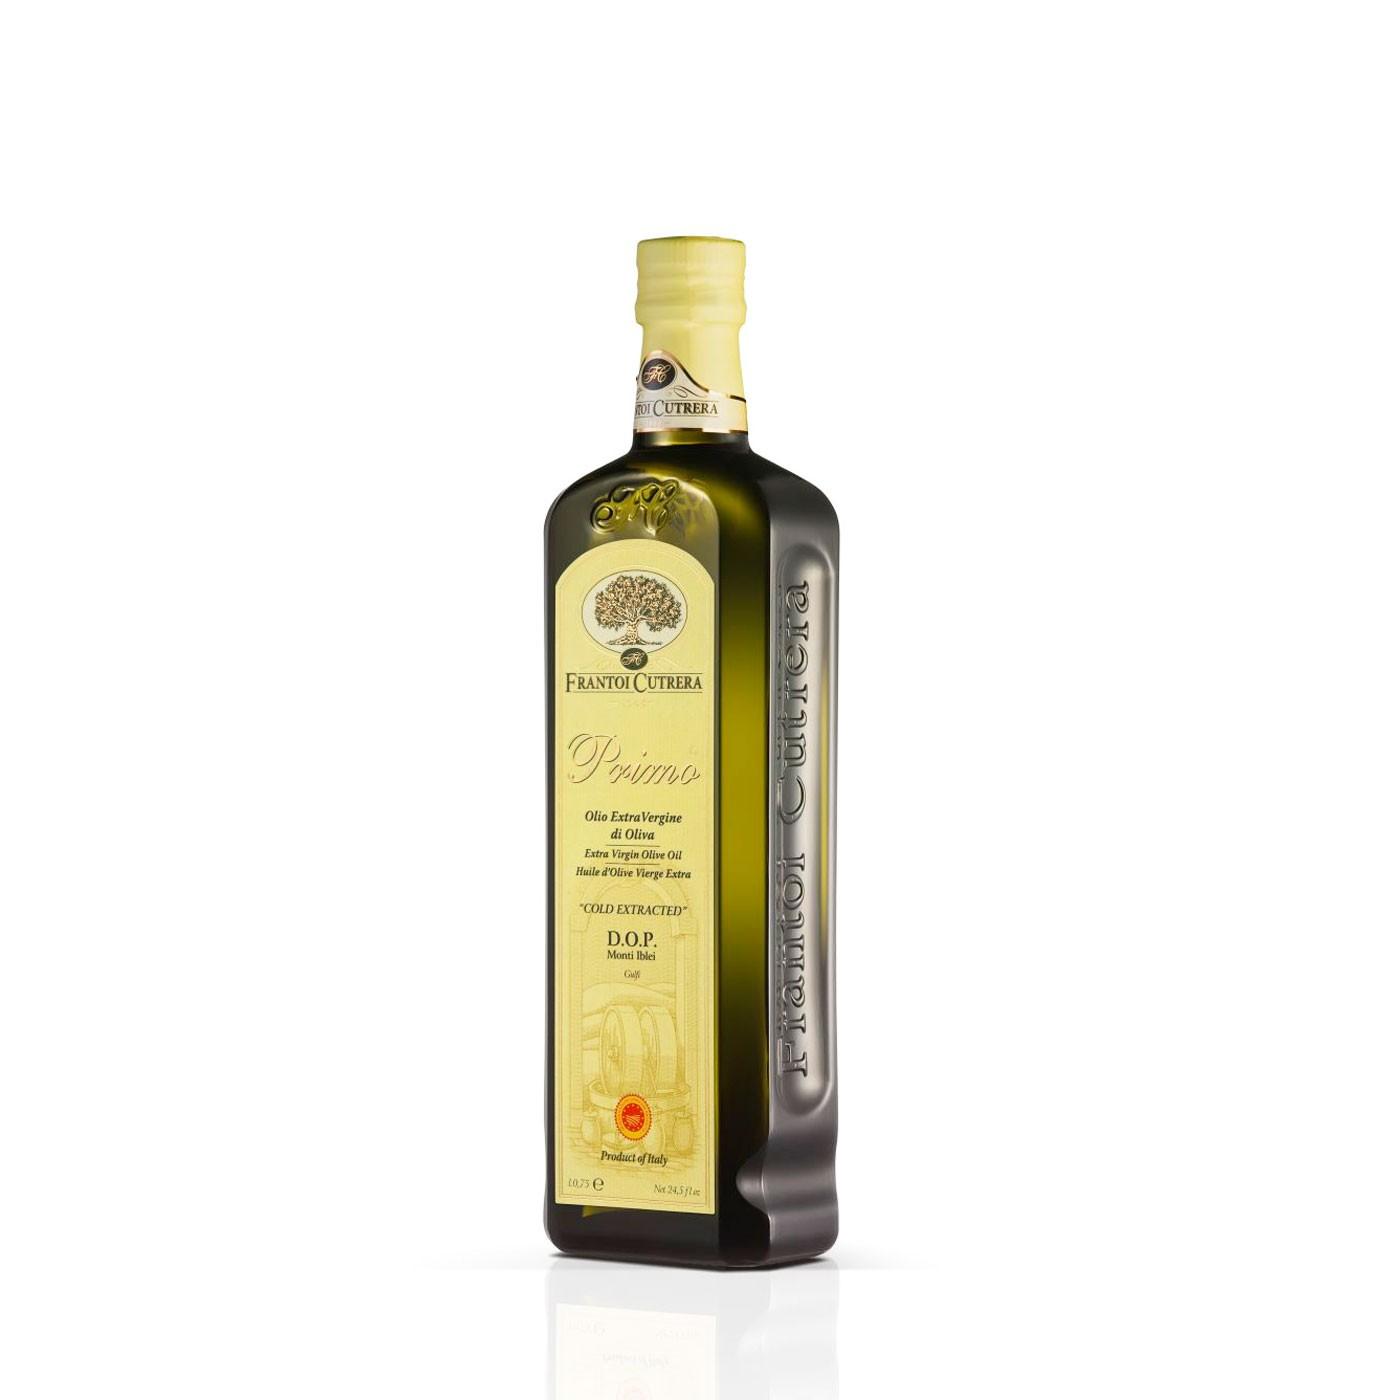 Sicilia Monti Iblei DOP Primo Extra Virgin Olive Oil 25.4 oz